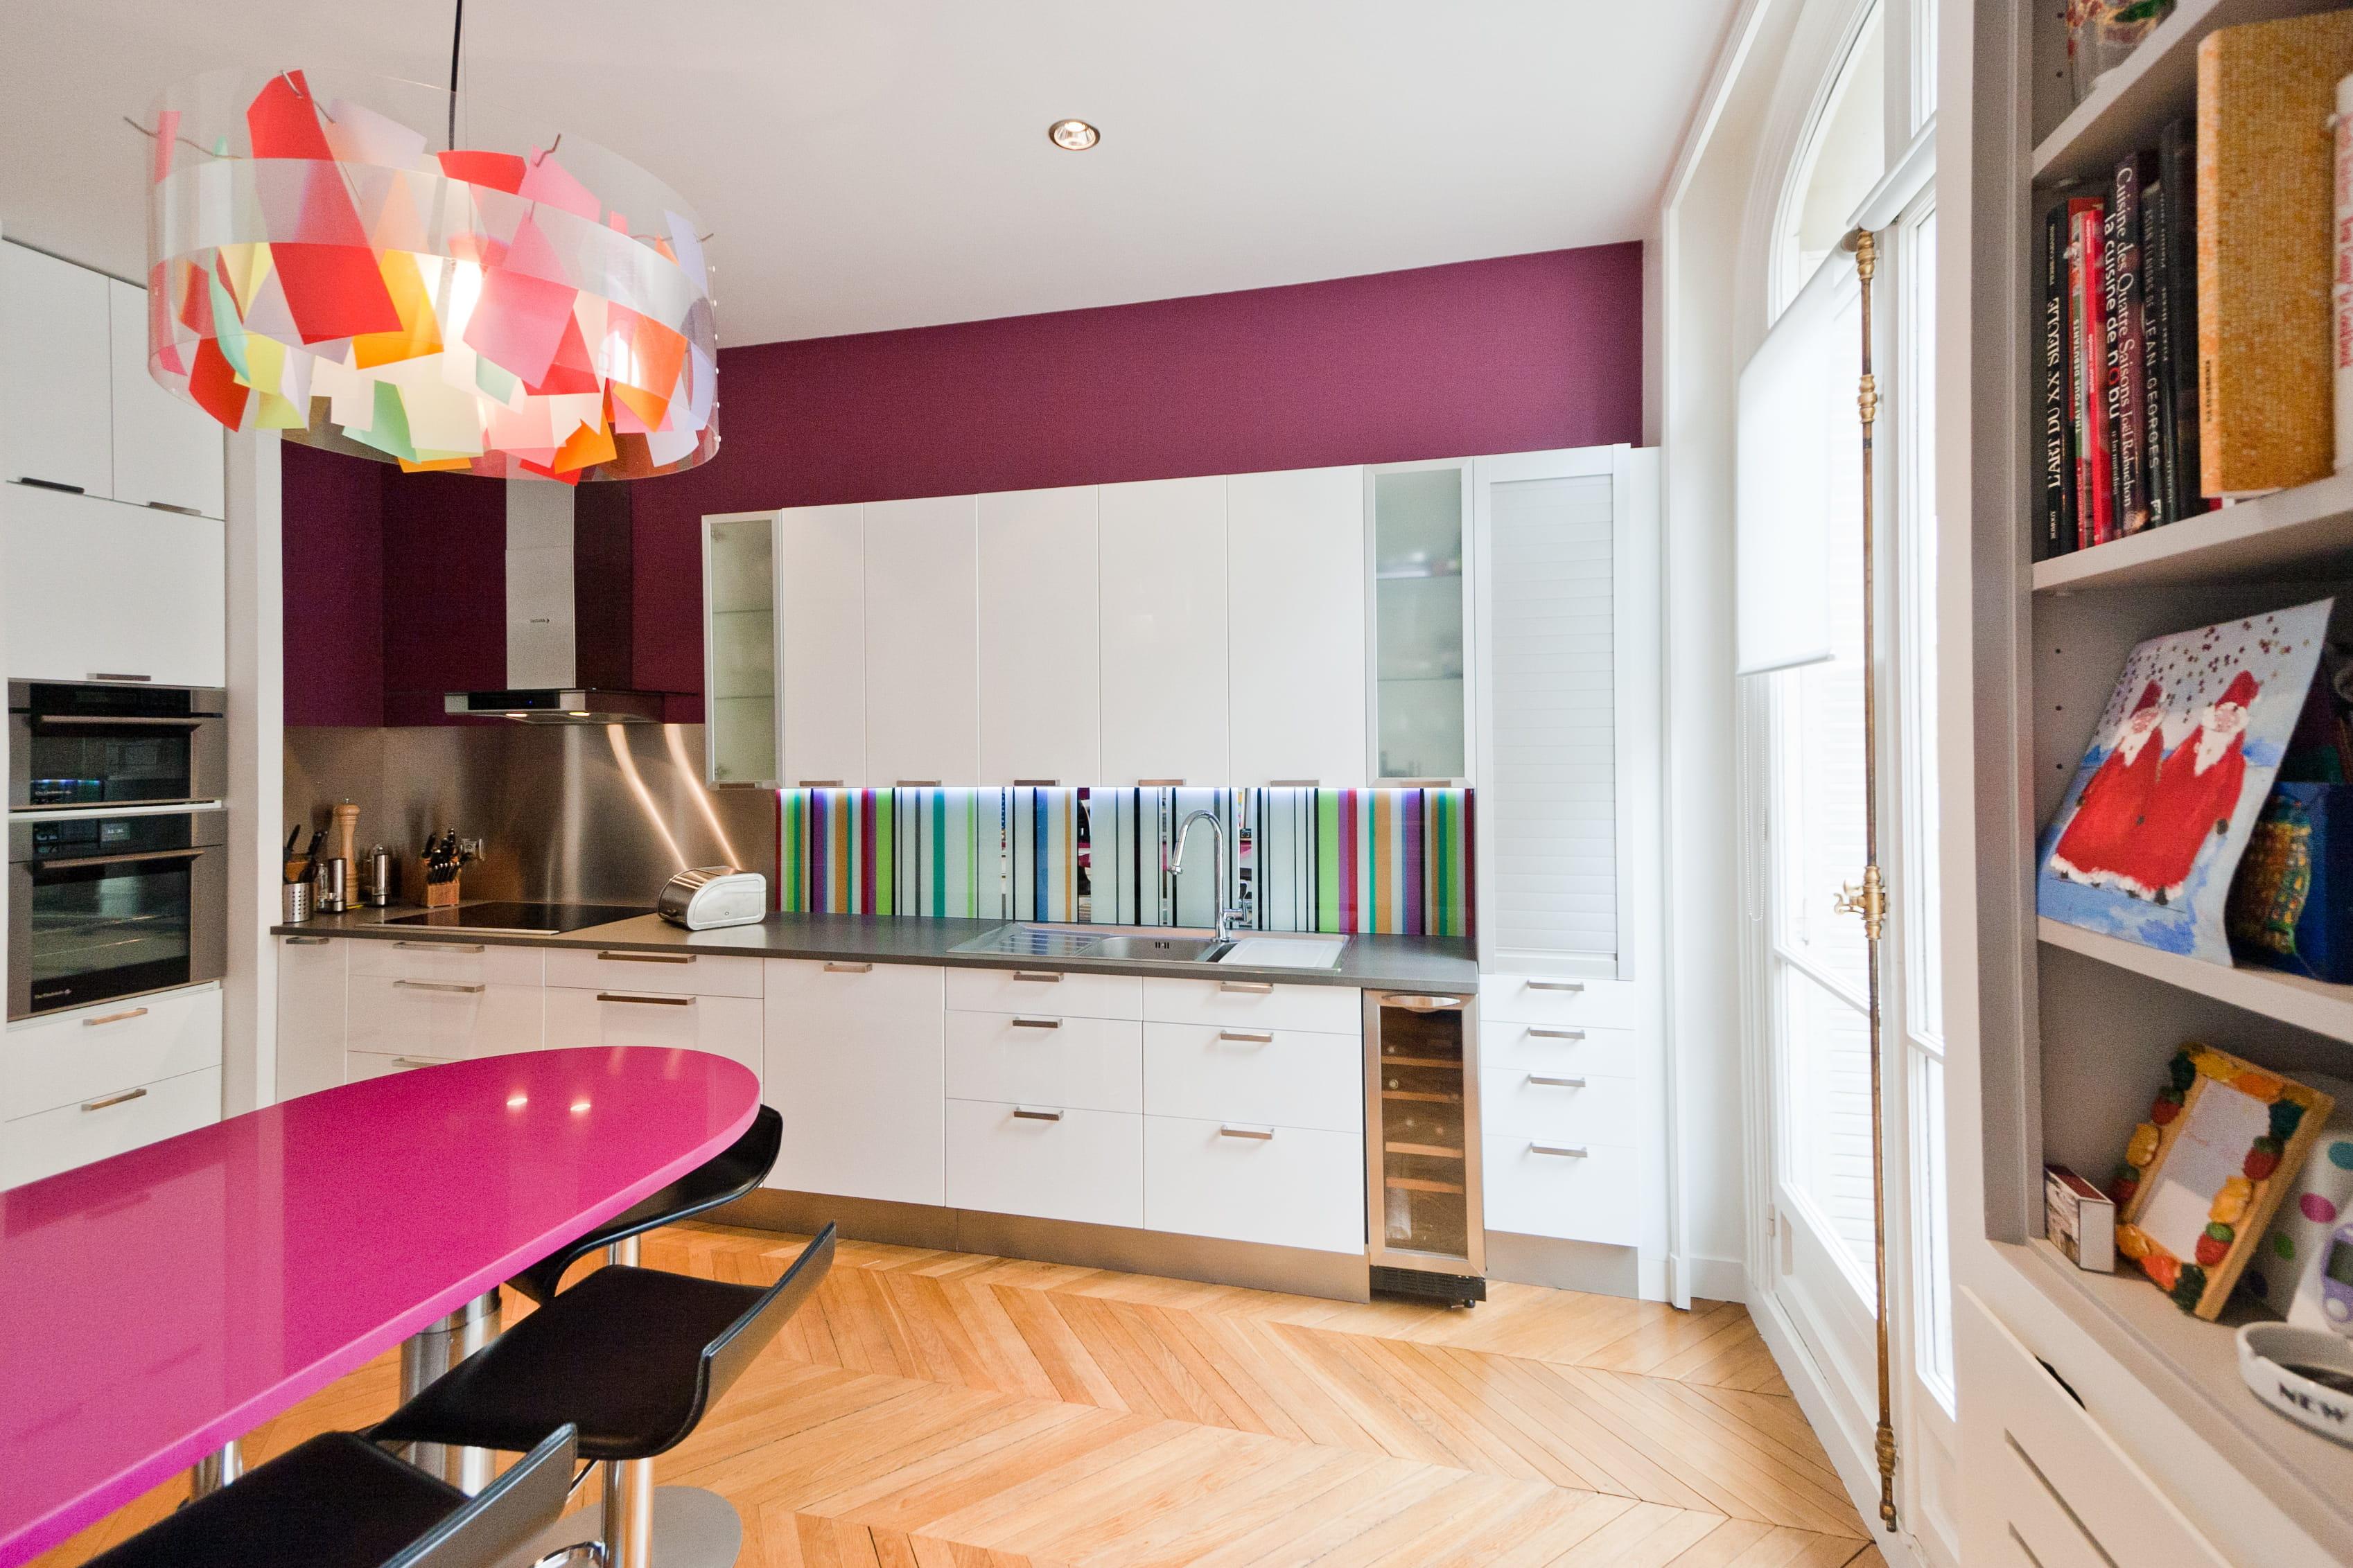 Tableau ardoise cuisine moderne: porte coulissante cuisine ...